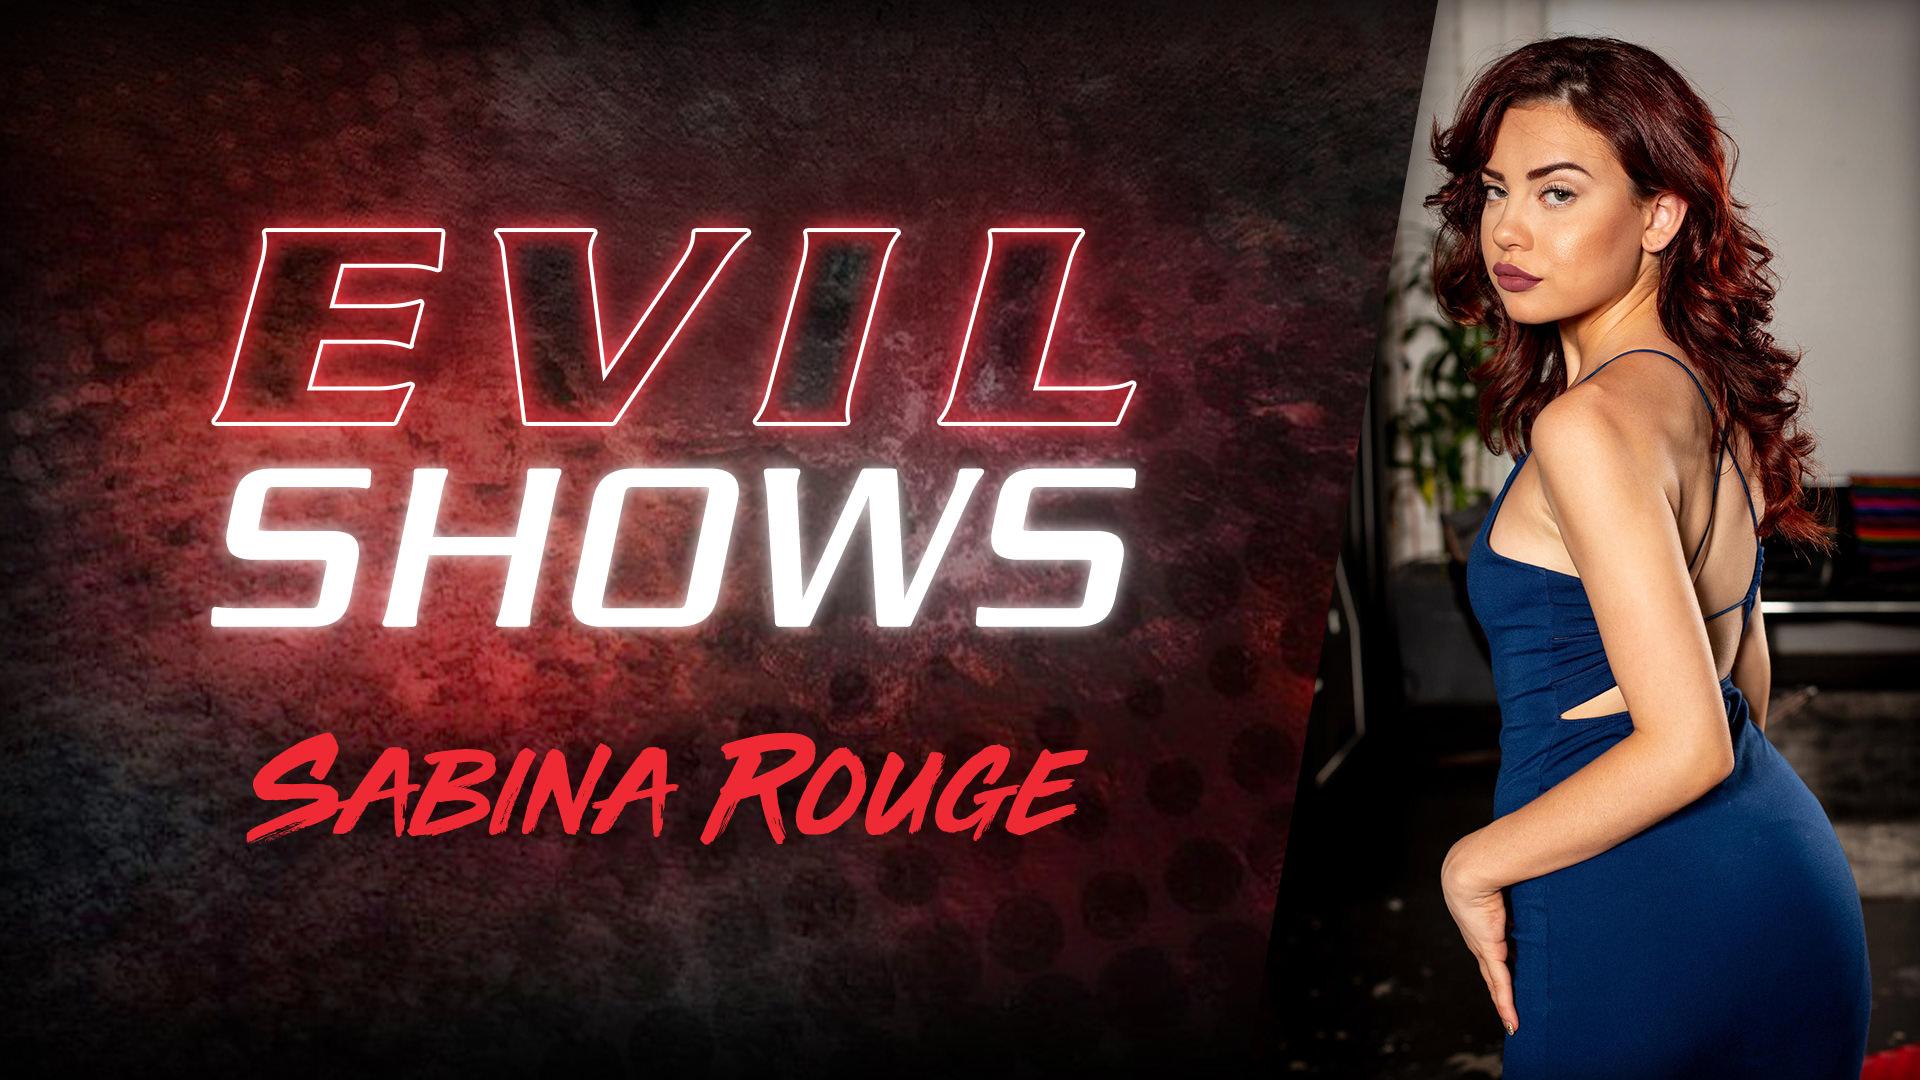 Evil Shows - Sabina Rouge - Sabina Rouge 1